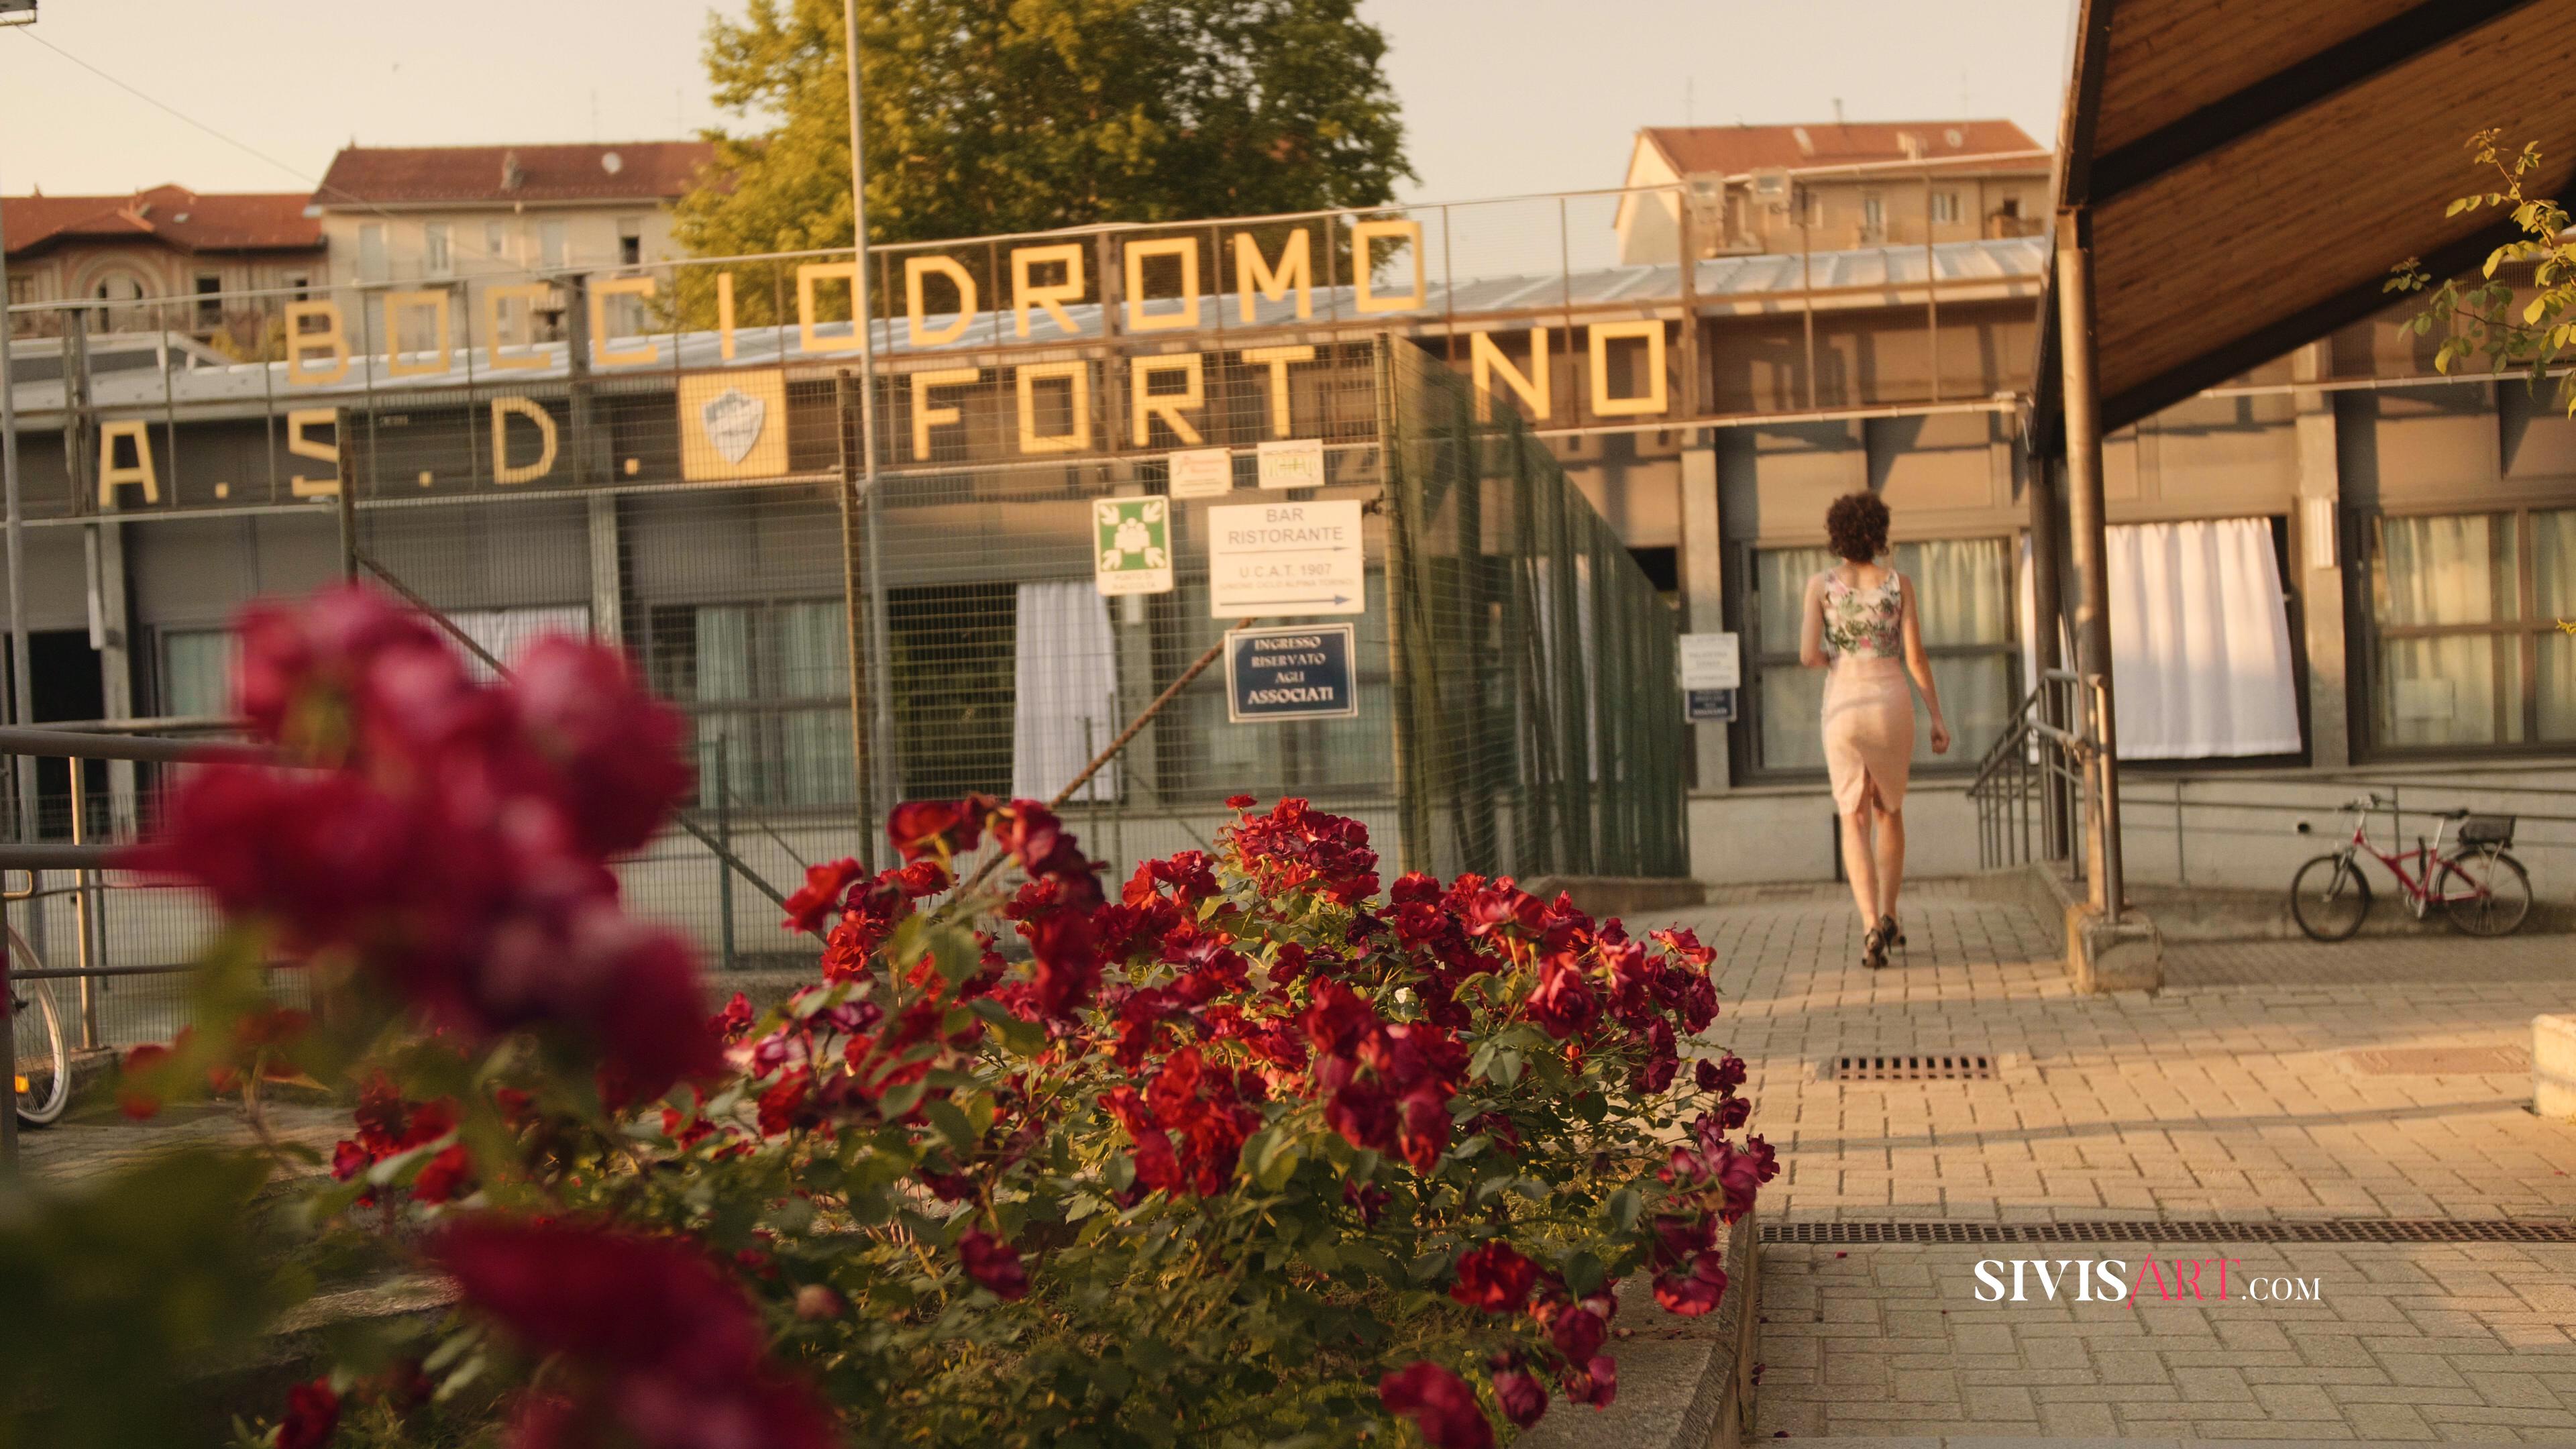 Sivis'art Videomaker presents Bollicine Tango Marathon 2019